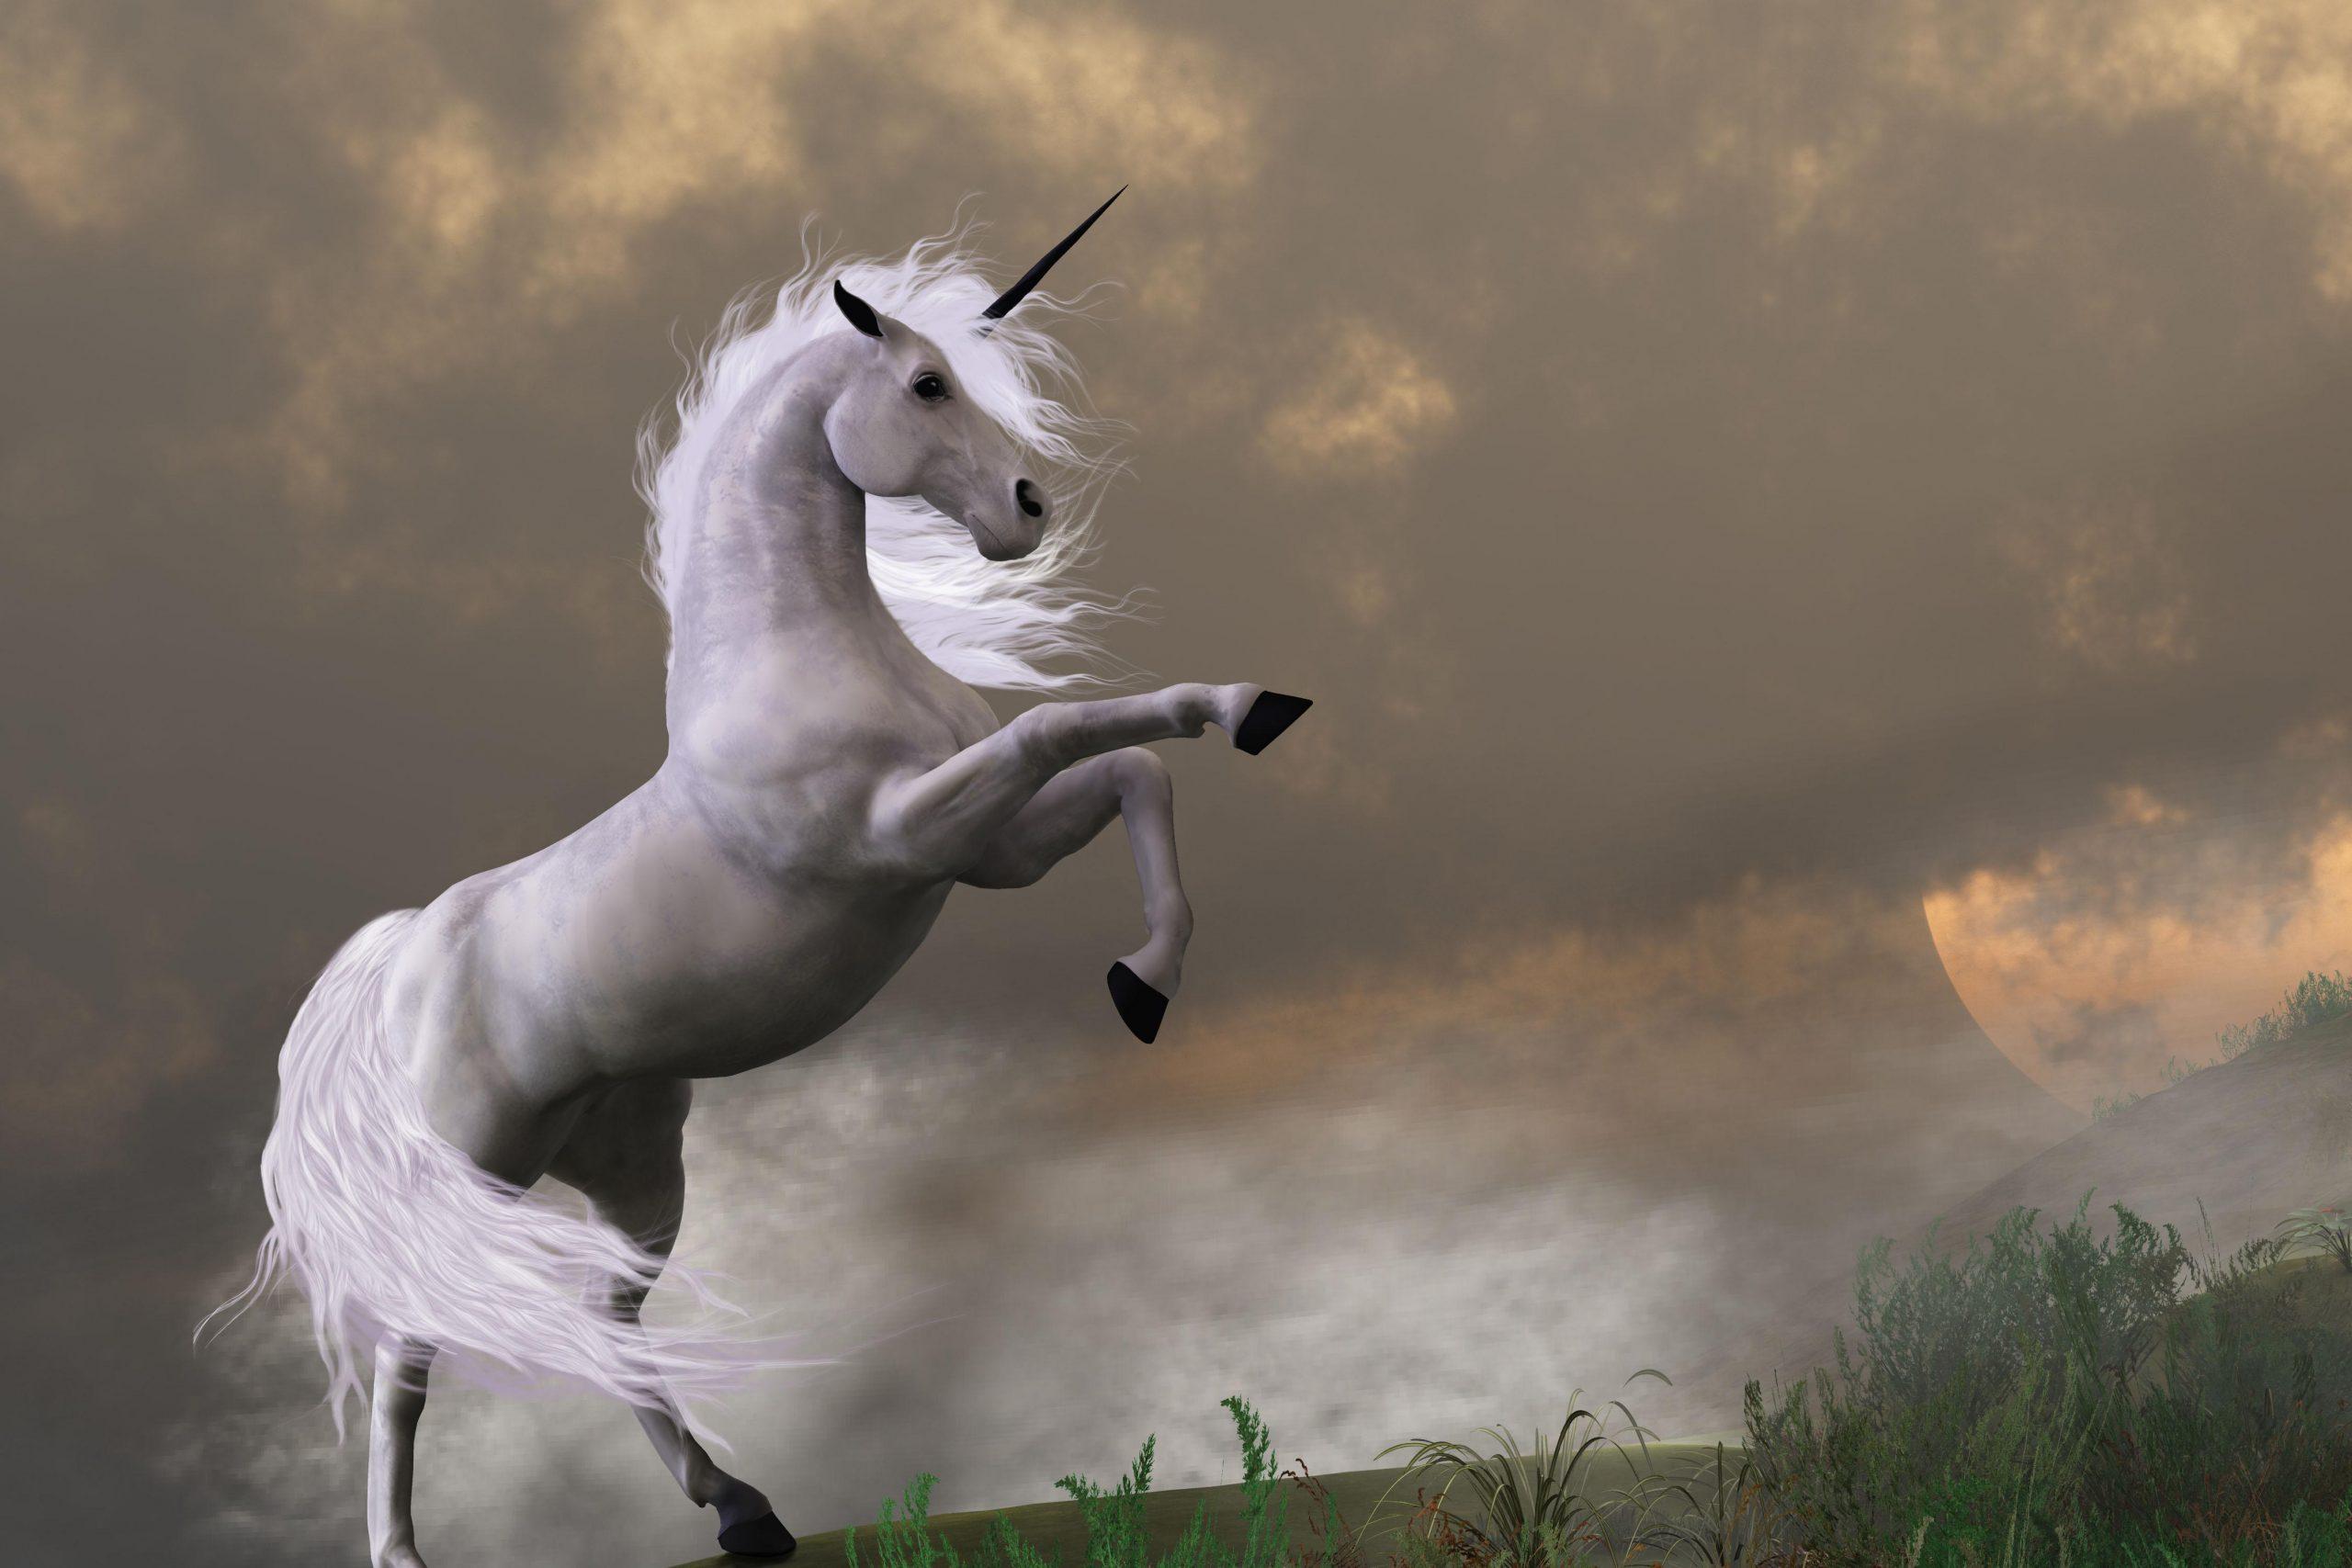 Finding the Mythical Unicorn